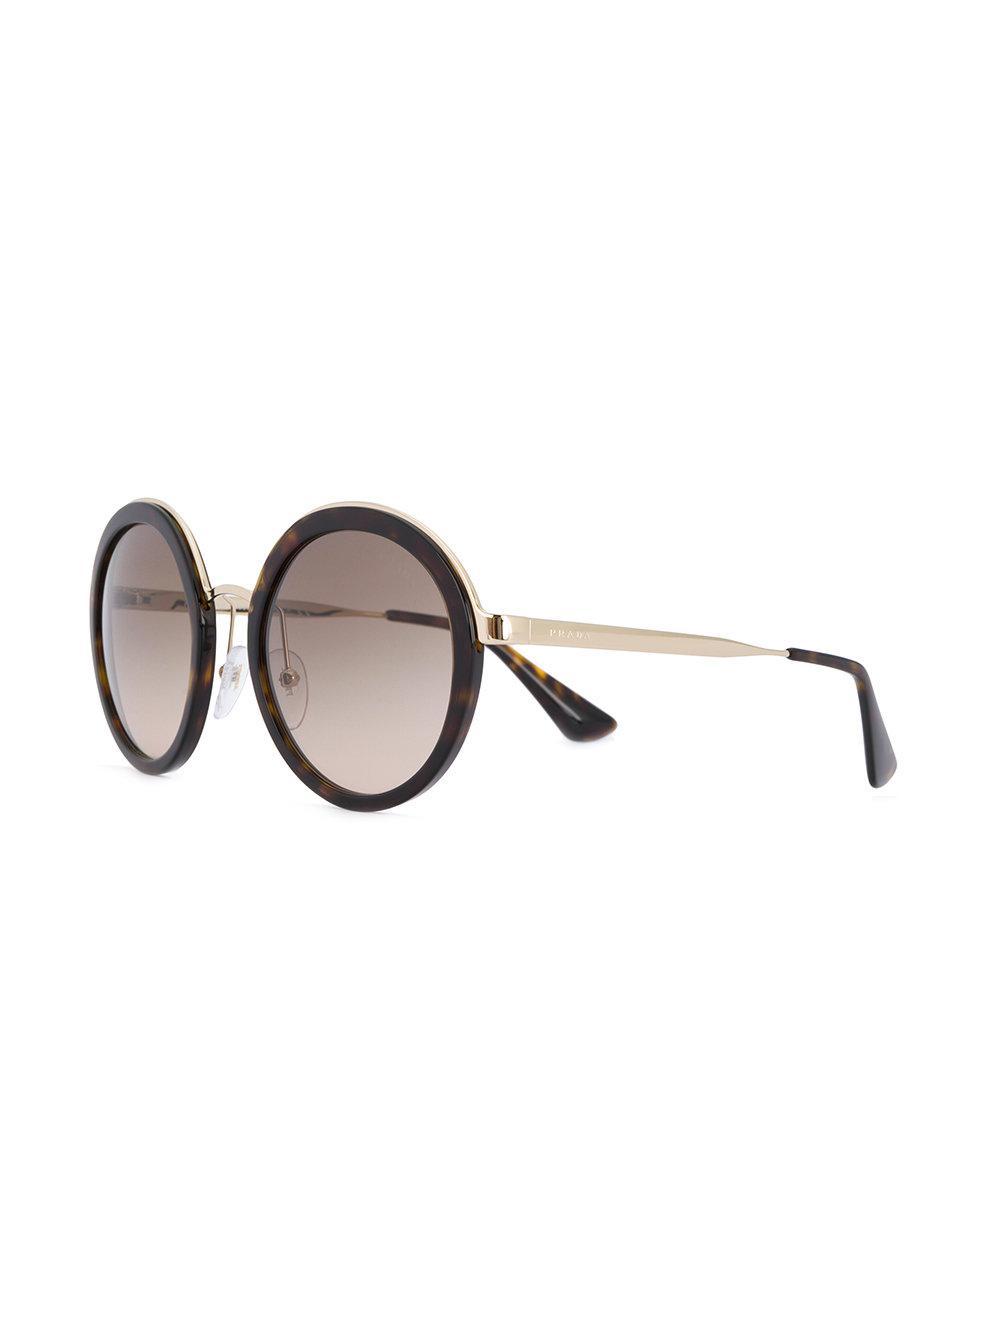 Prada Oversized Round Frame Sunglasses in Brown